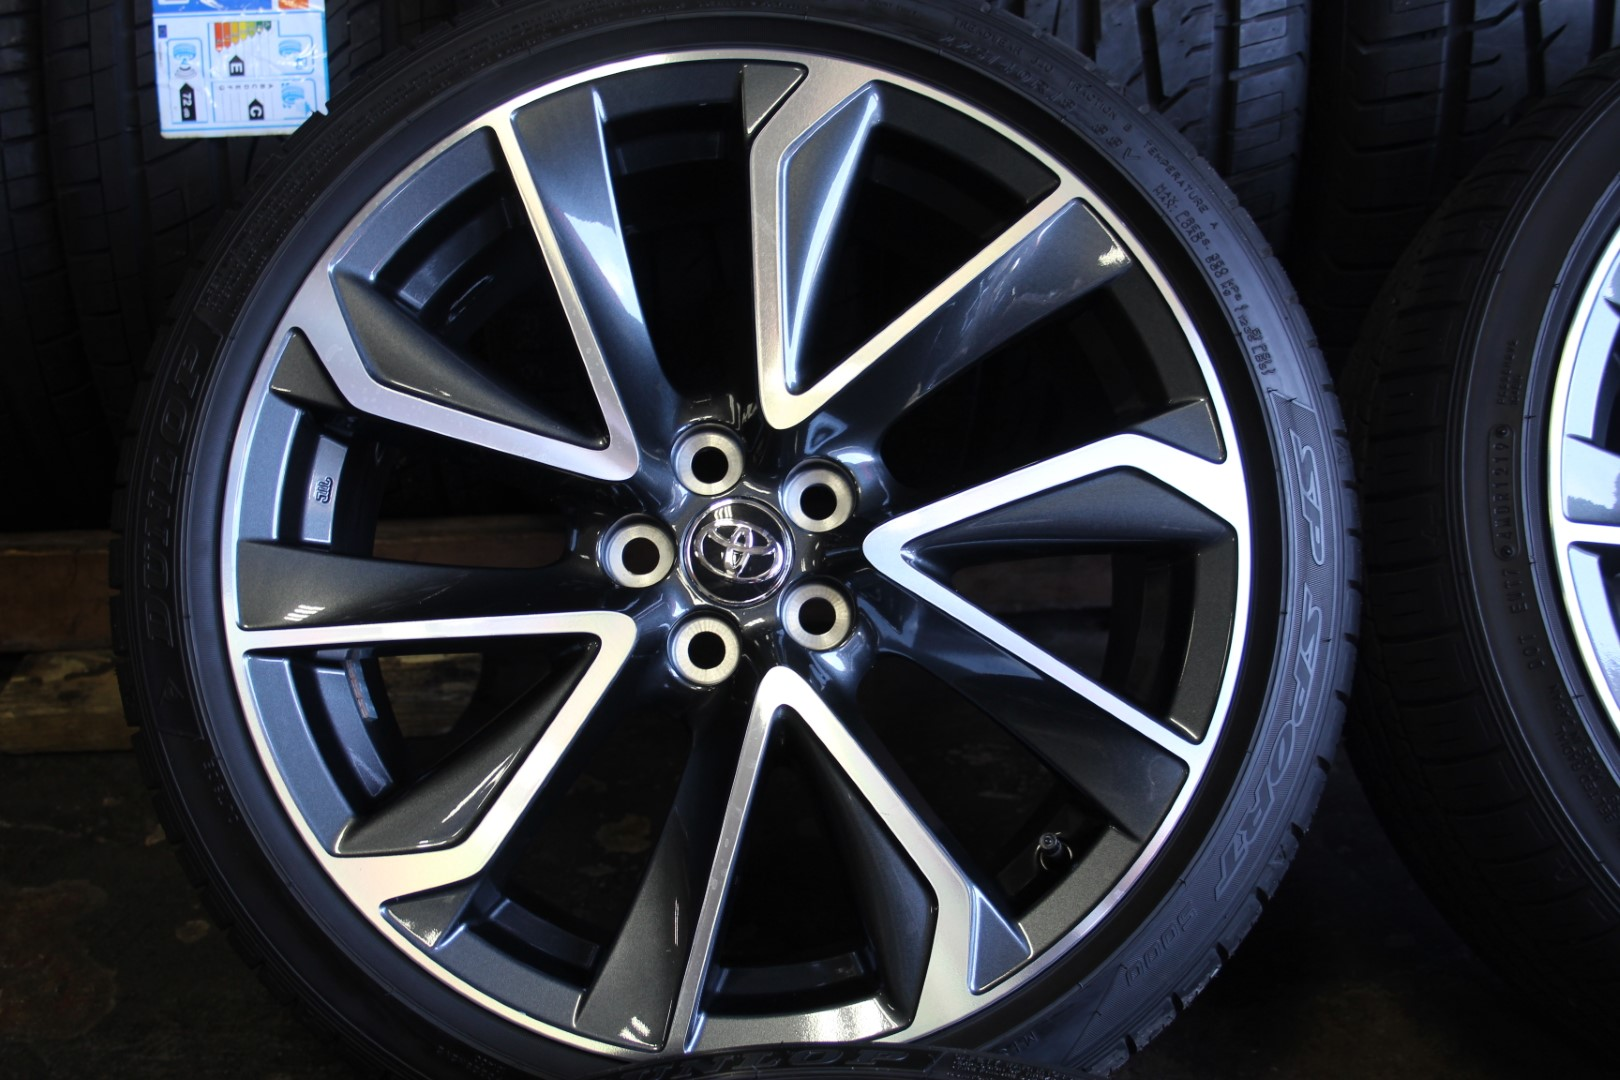 Toyota Corolla Tires >> Toyota Corolla Tires Best Upcoming Car Release 2020